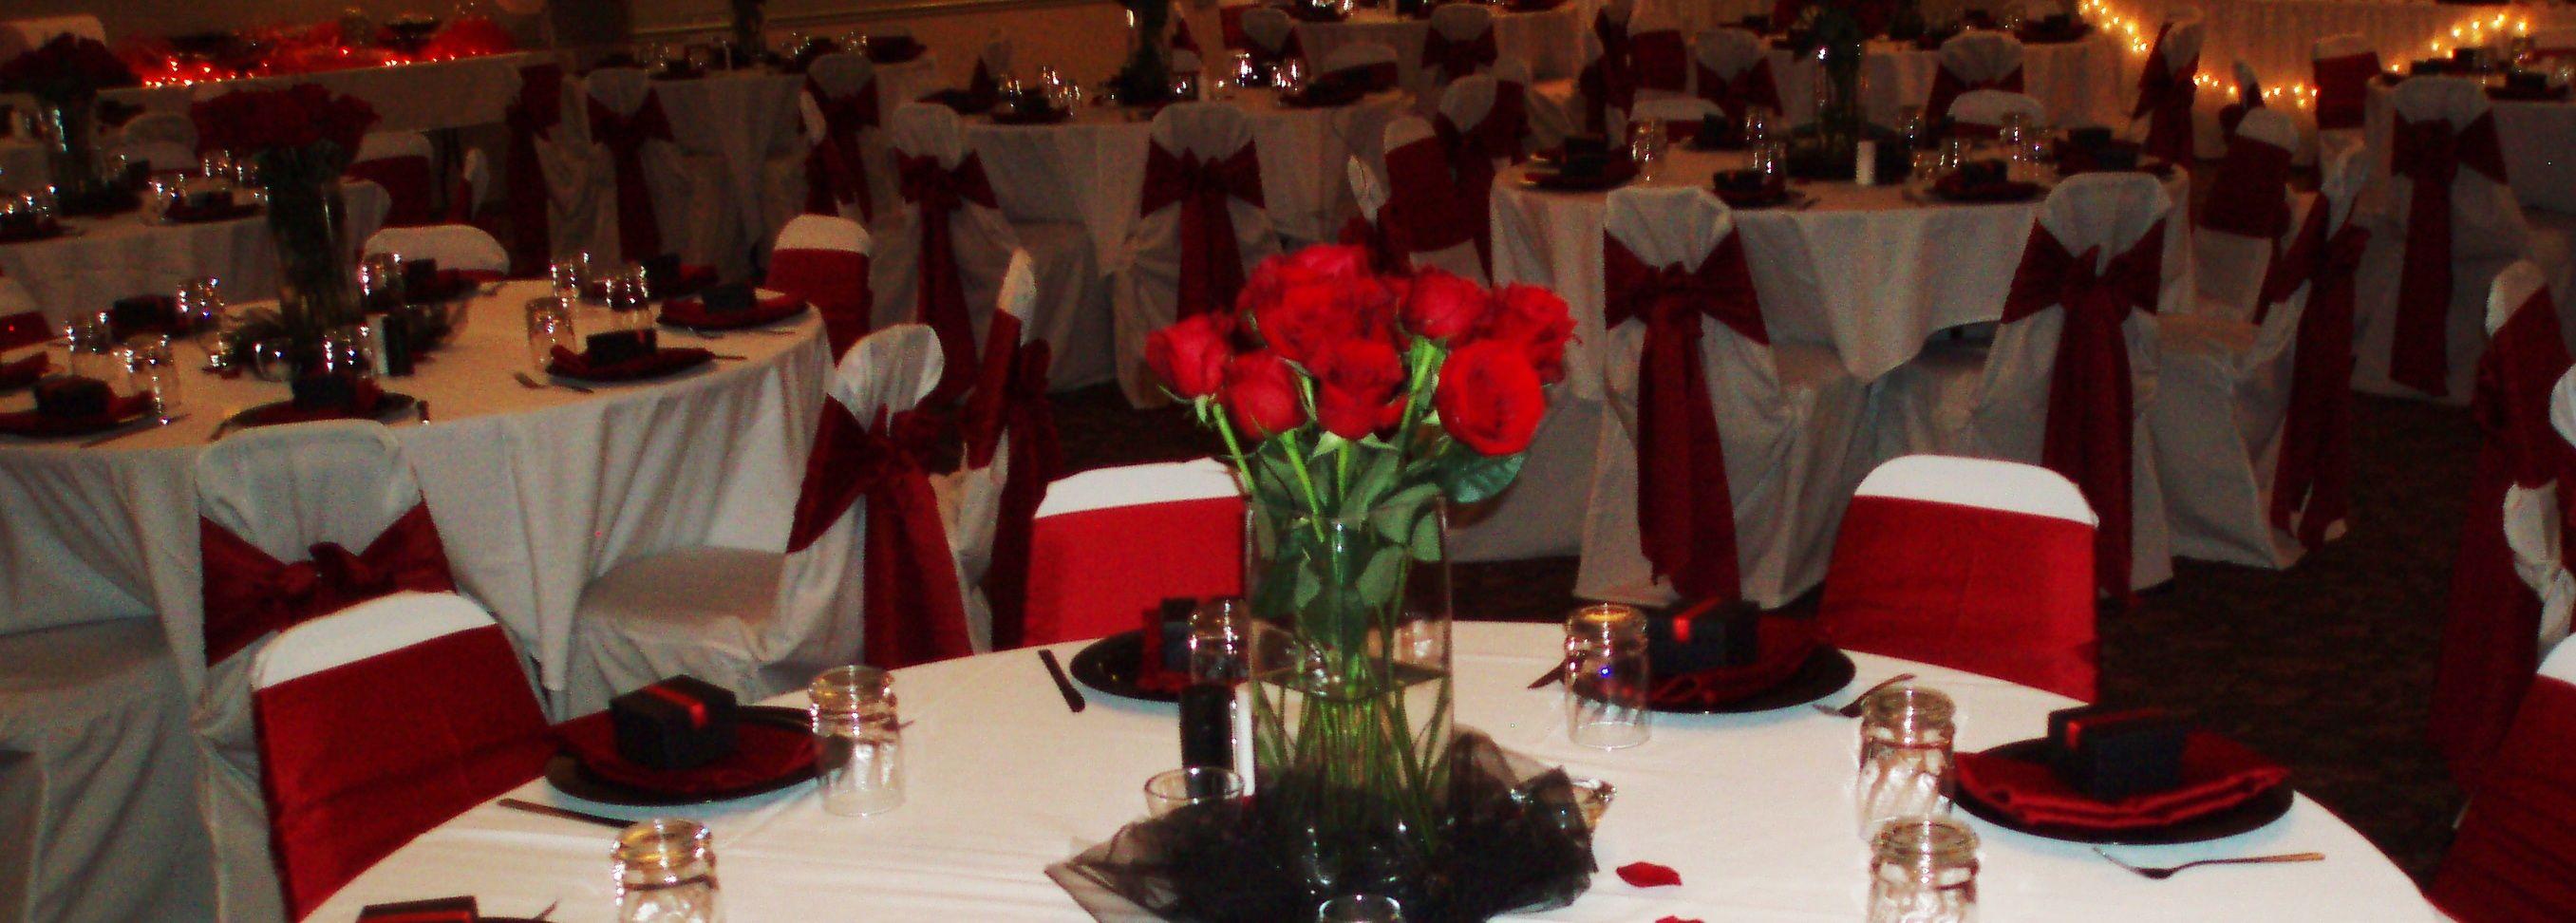 Red Rose Wedding | Weddings at The Venetian Club | Pinterest ...